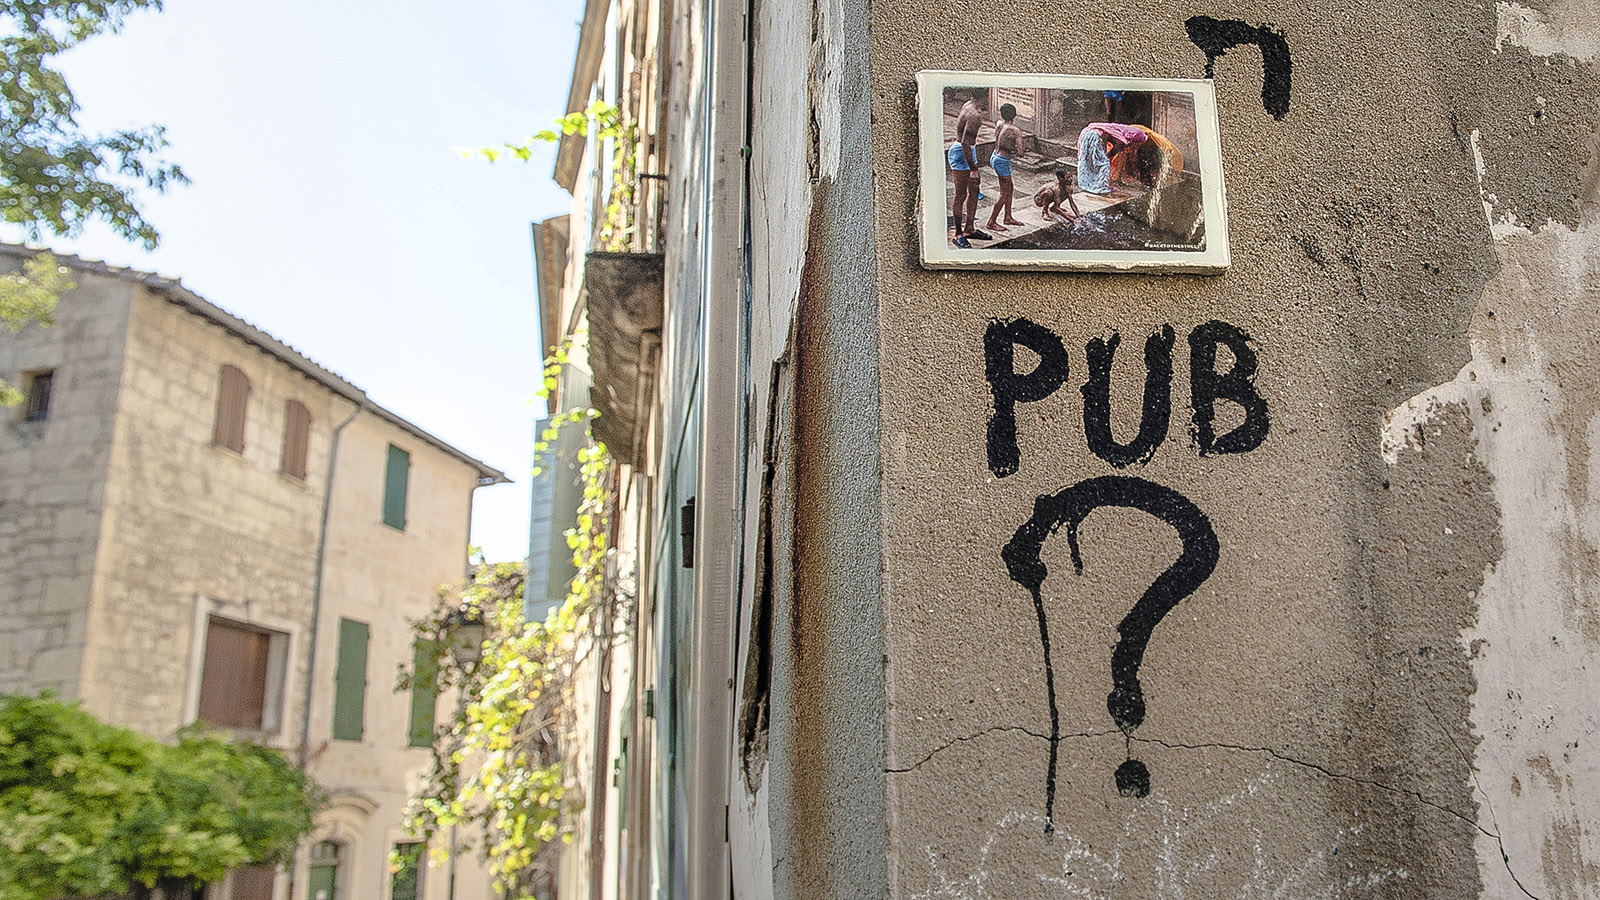 Arles: Street Art in der Altstadt. Foto: Hilke Maunder